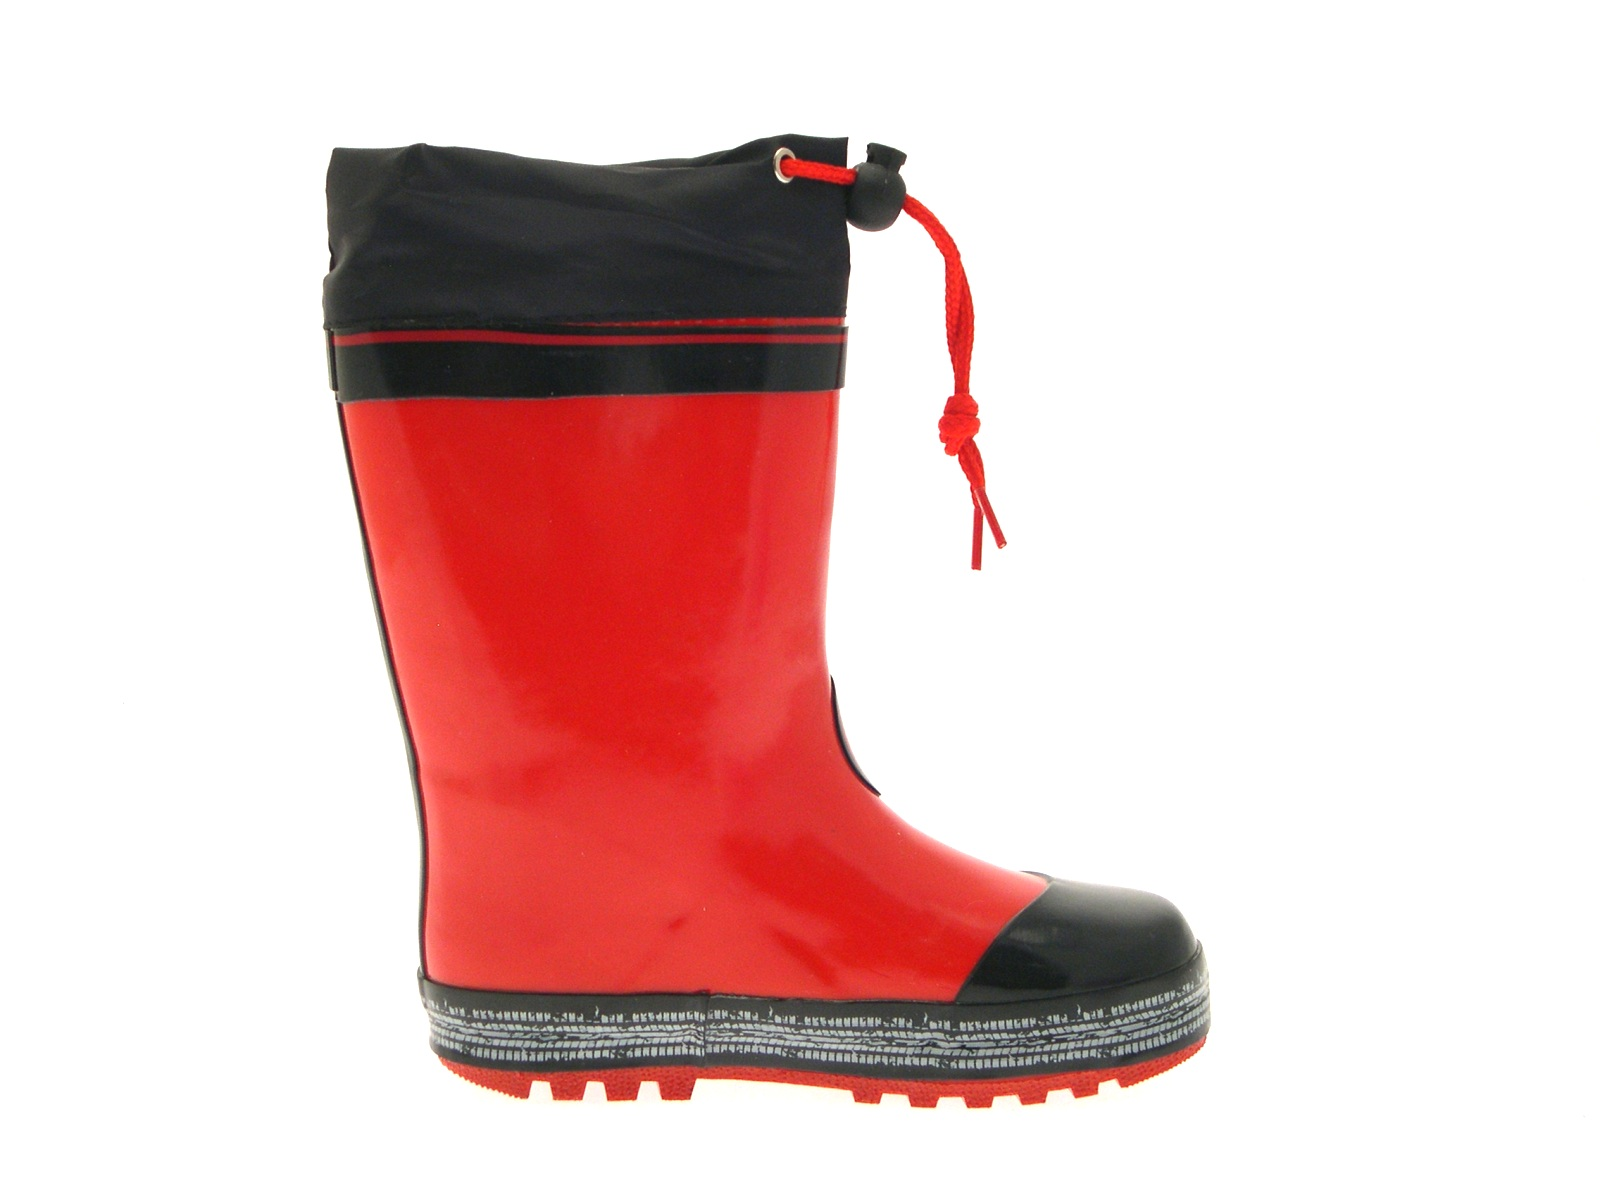 disney cars lightning mcqueen rubber snow boots wellies